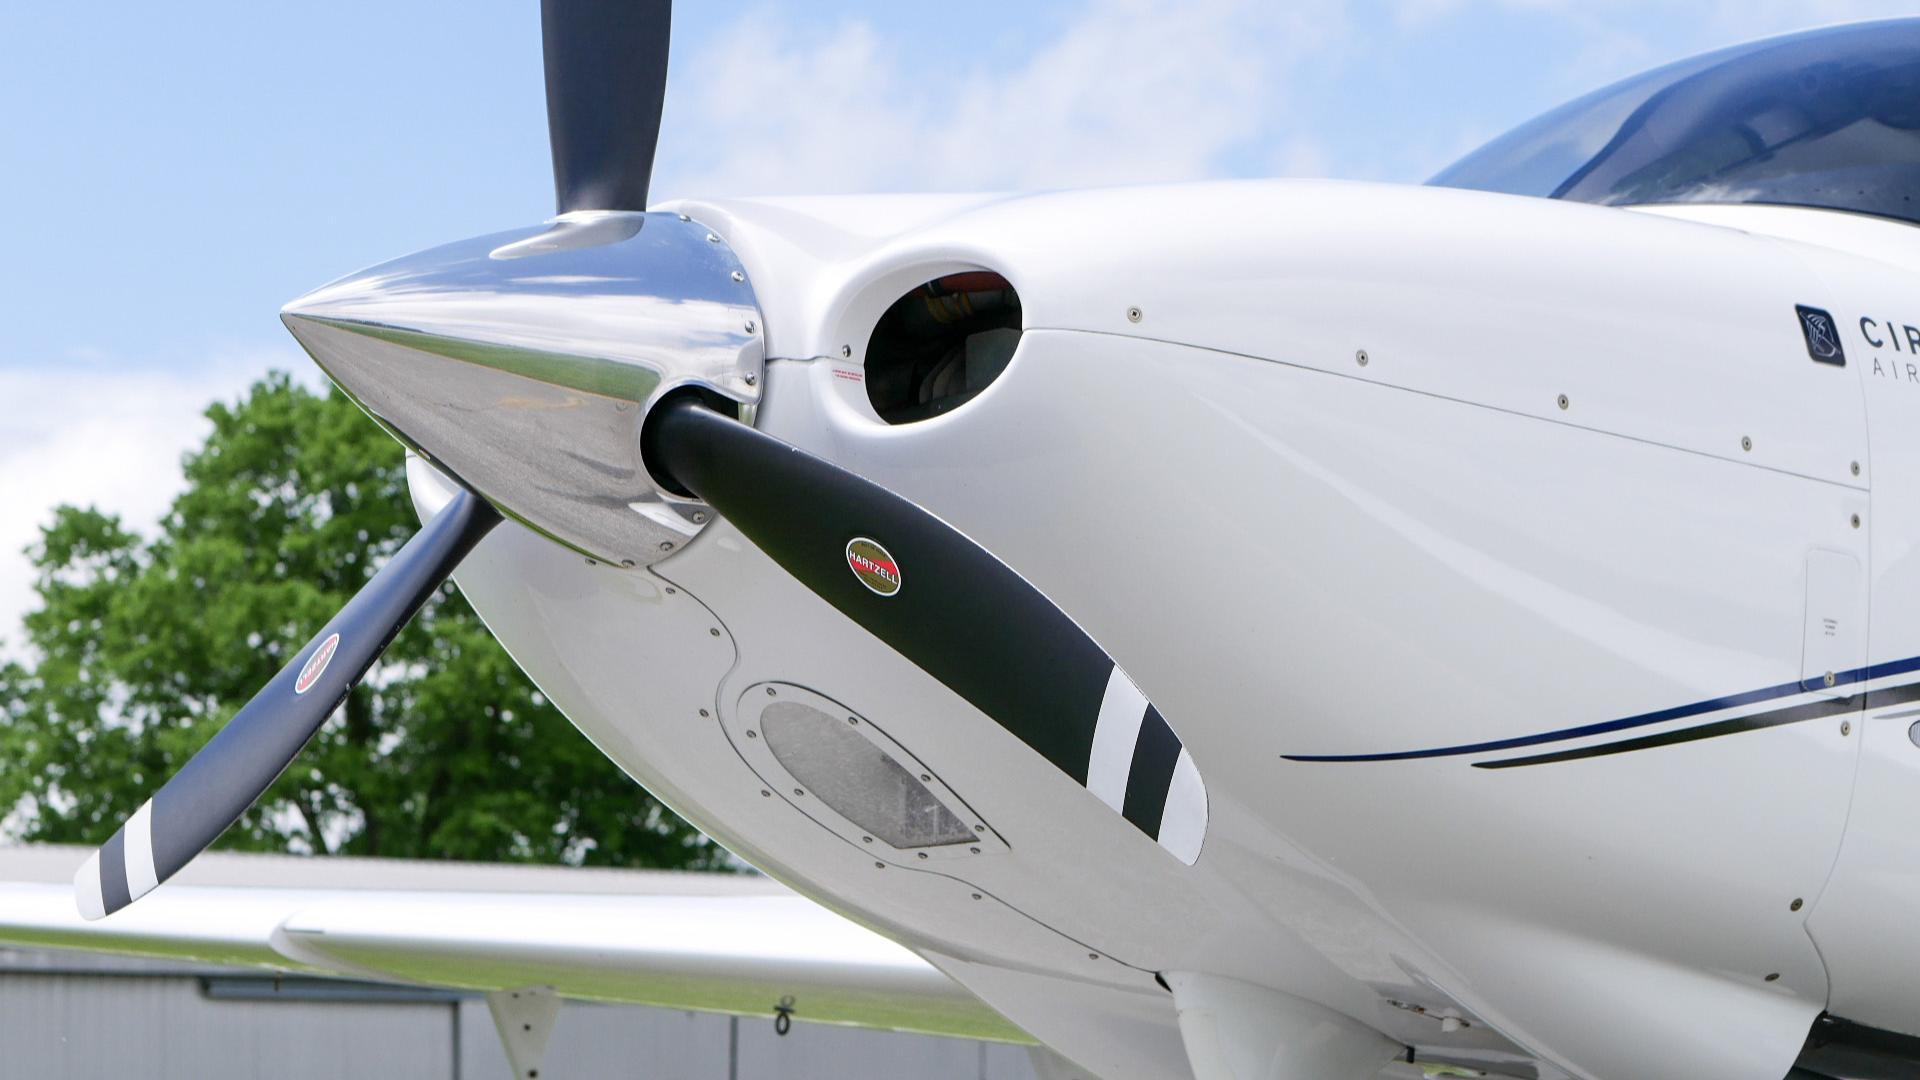 2012 Cirrus SR20 G3